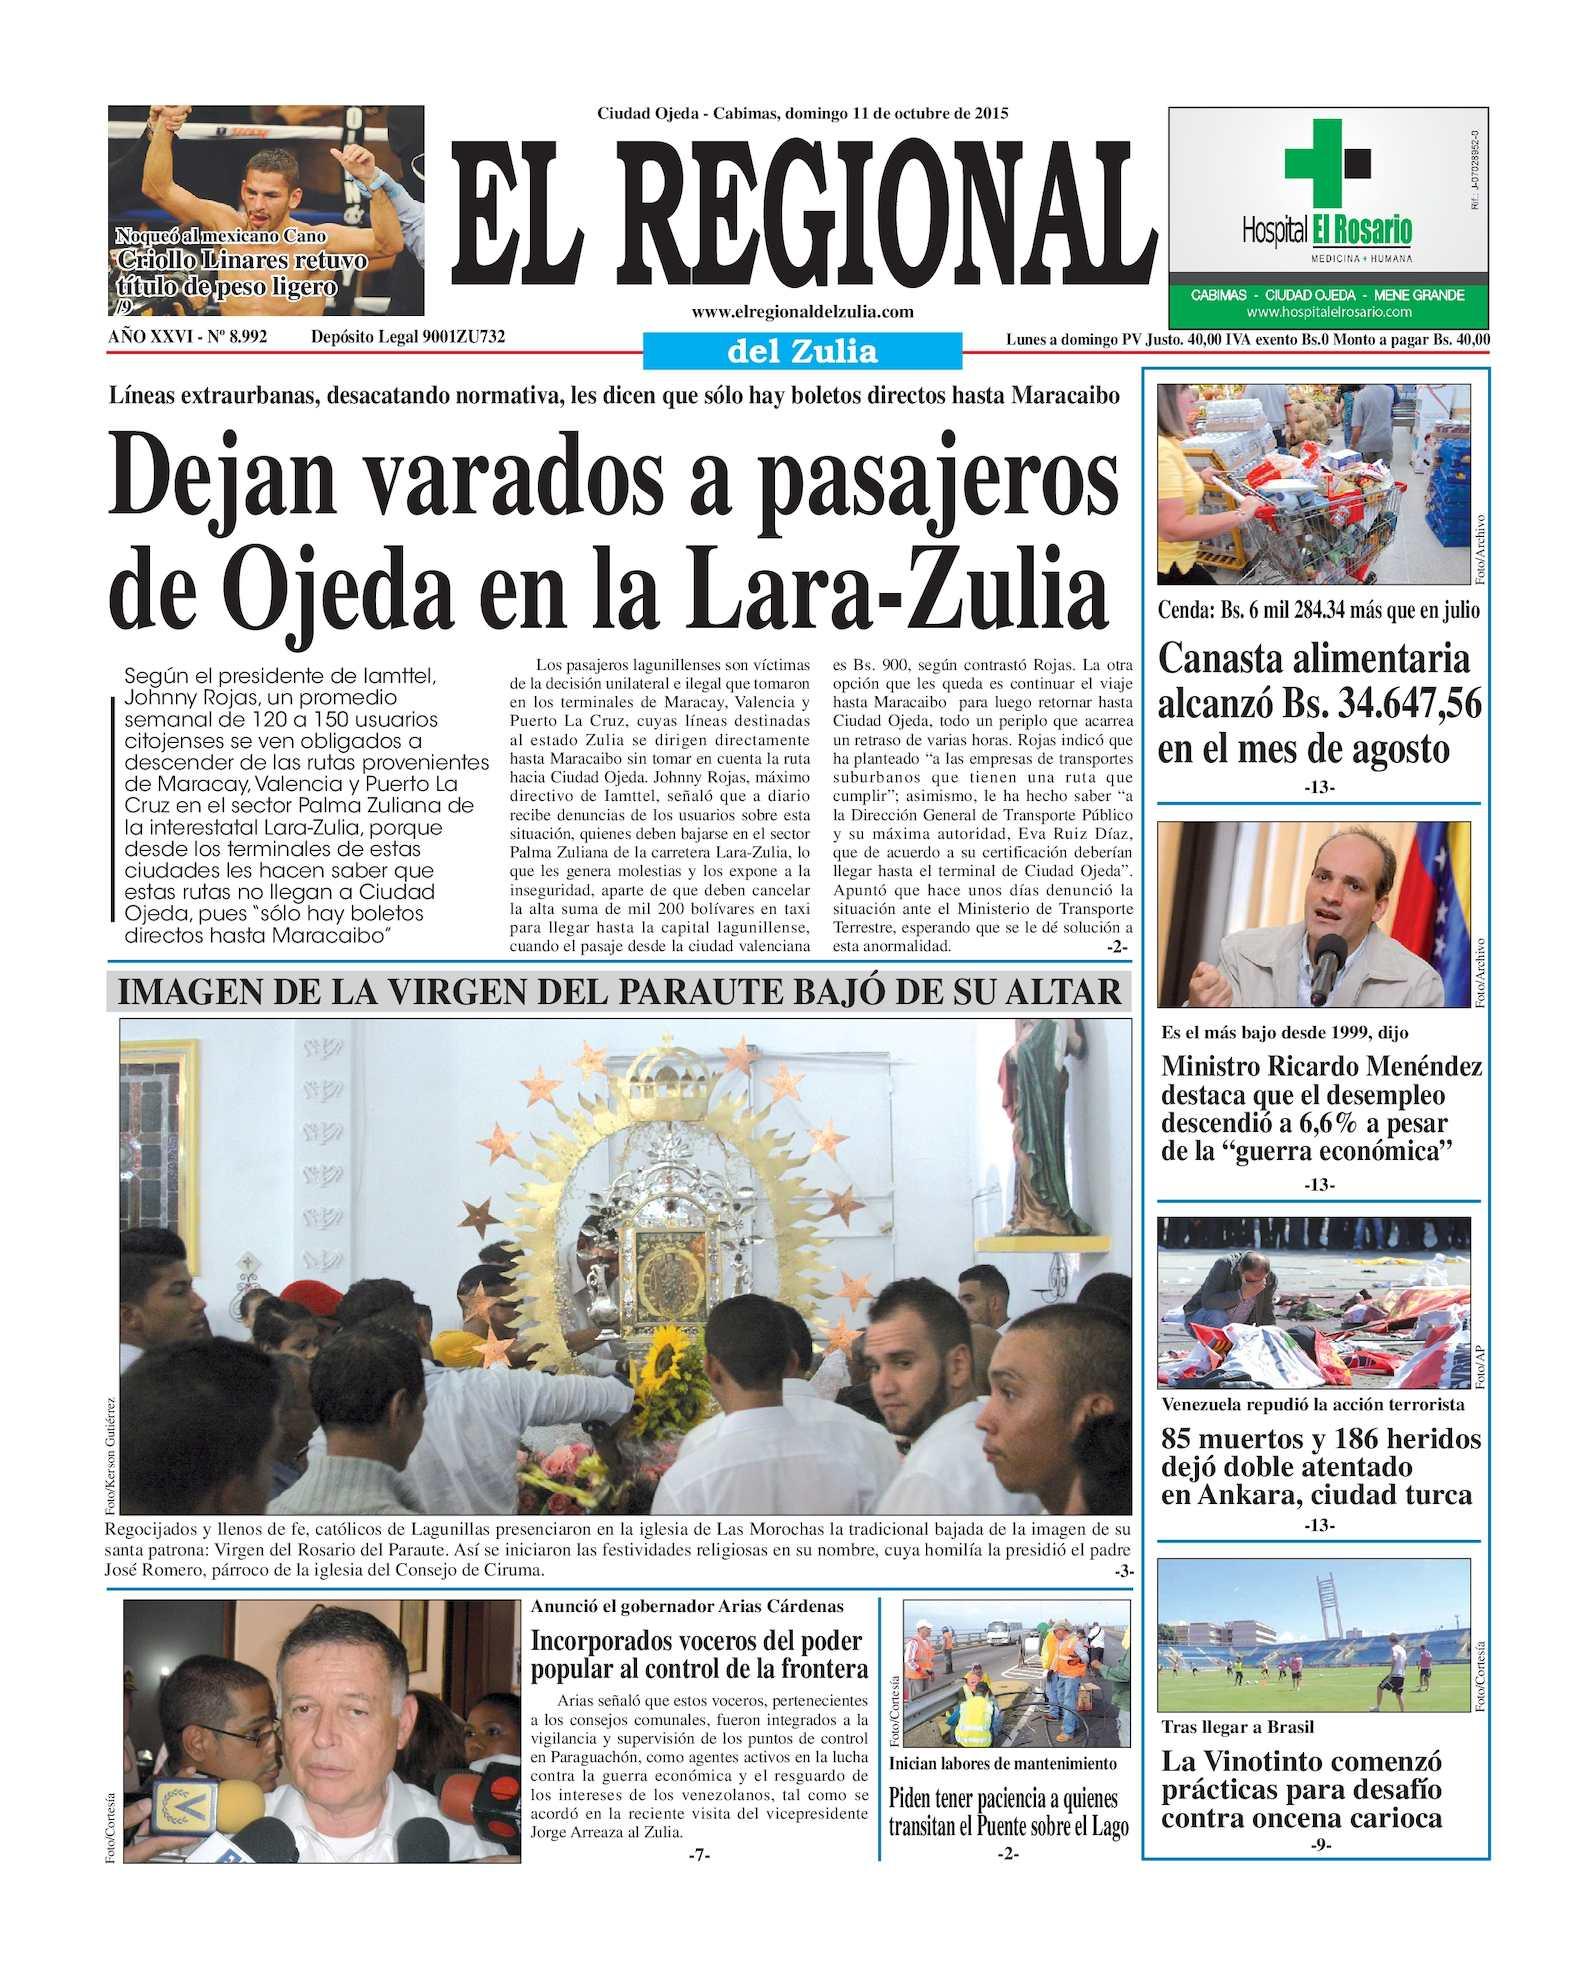 Calaméo - El Regional del Zulia 11-10-2015